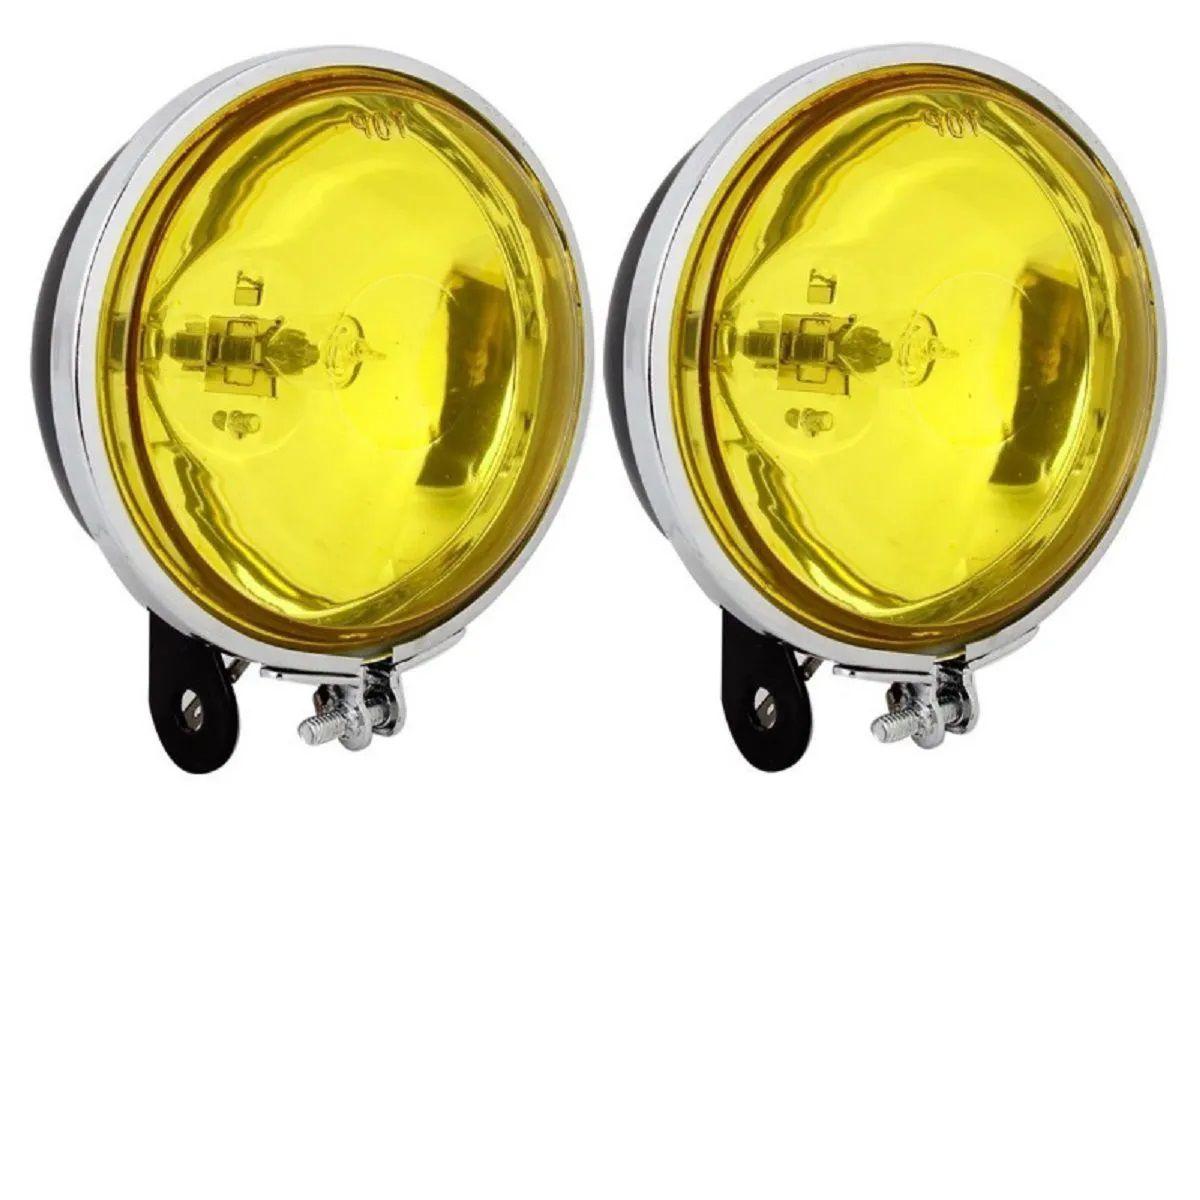 Par Mini Farol De Milha Amarelo Redondo Auxiliar Neblina H3 Halogena Off Road Clássico - 90mm 3 Polegadas